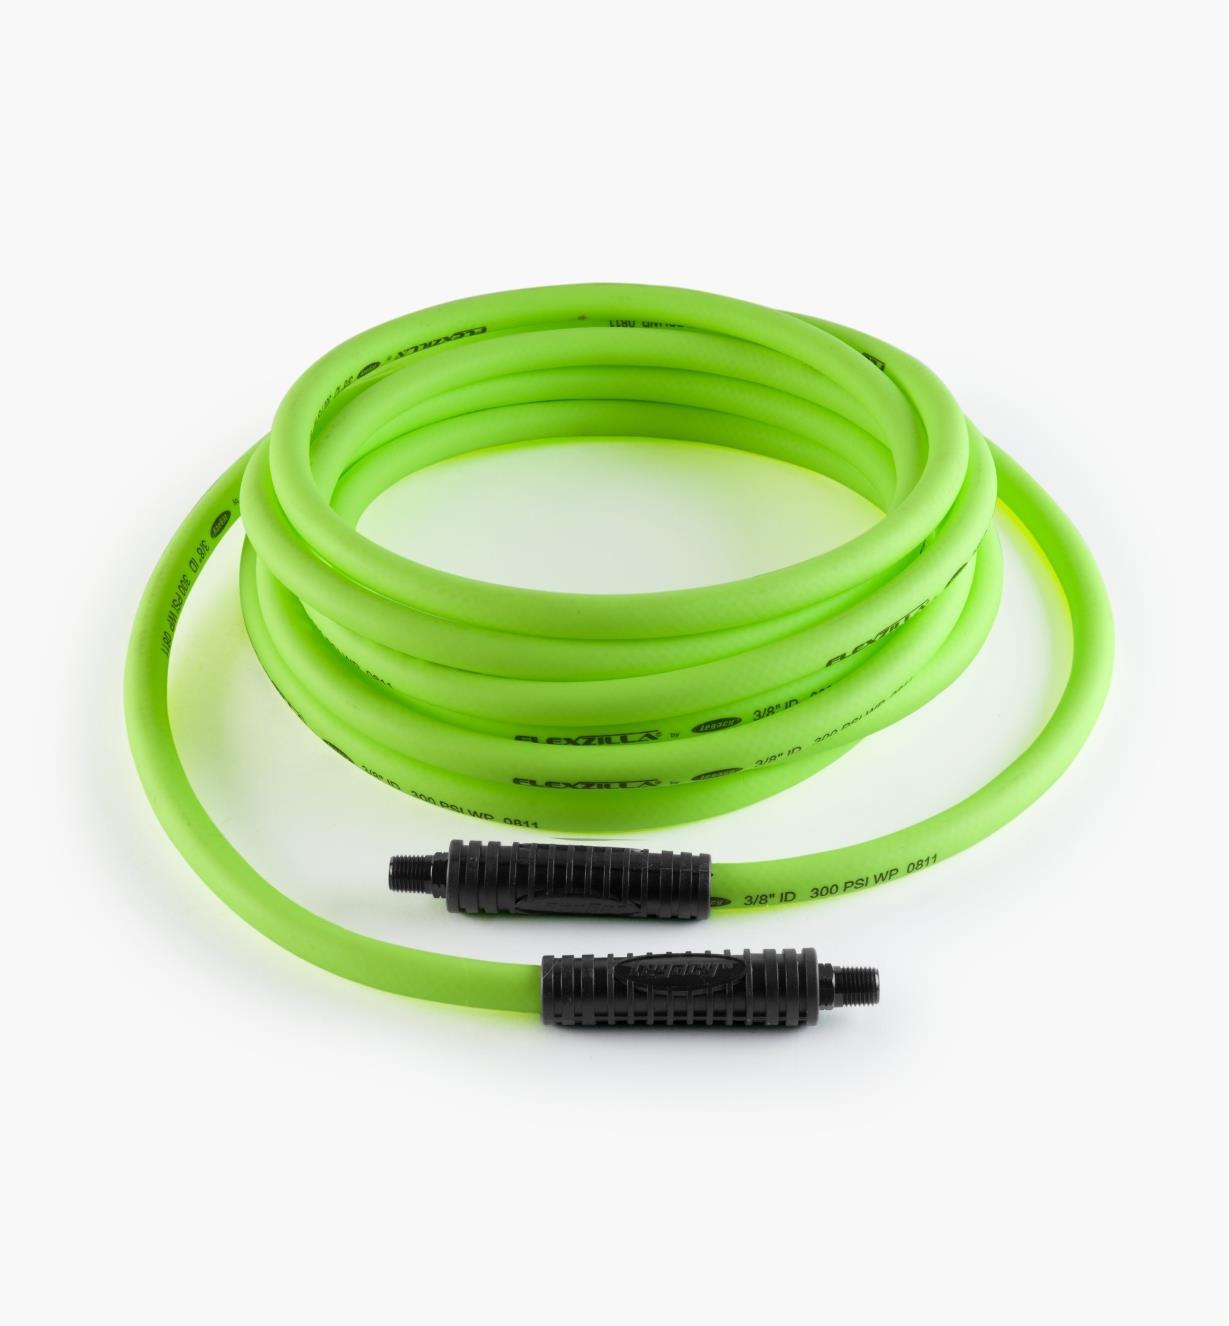 99W8650 - Tuyau de 50pi pour outils pneumatiques Flexzilla